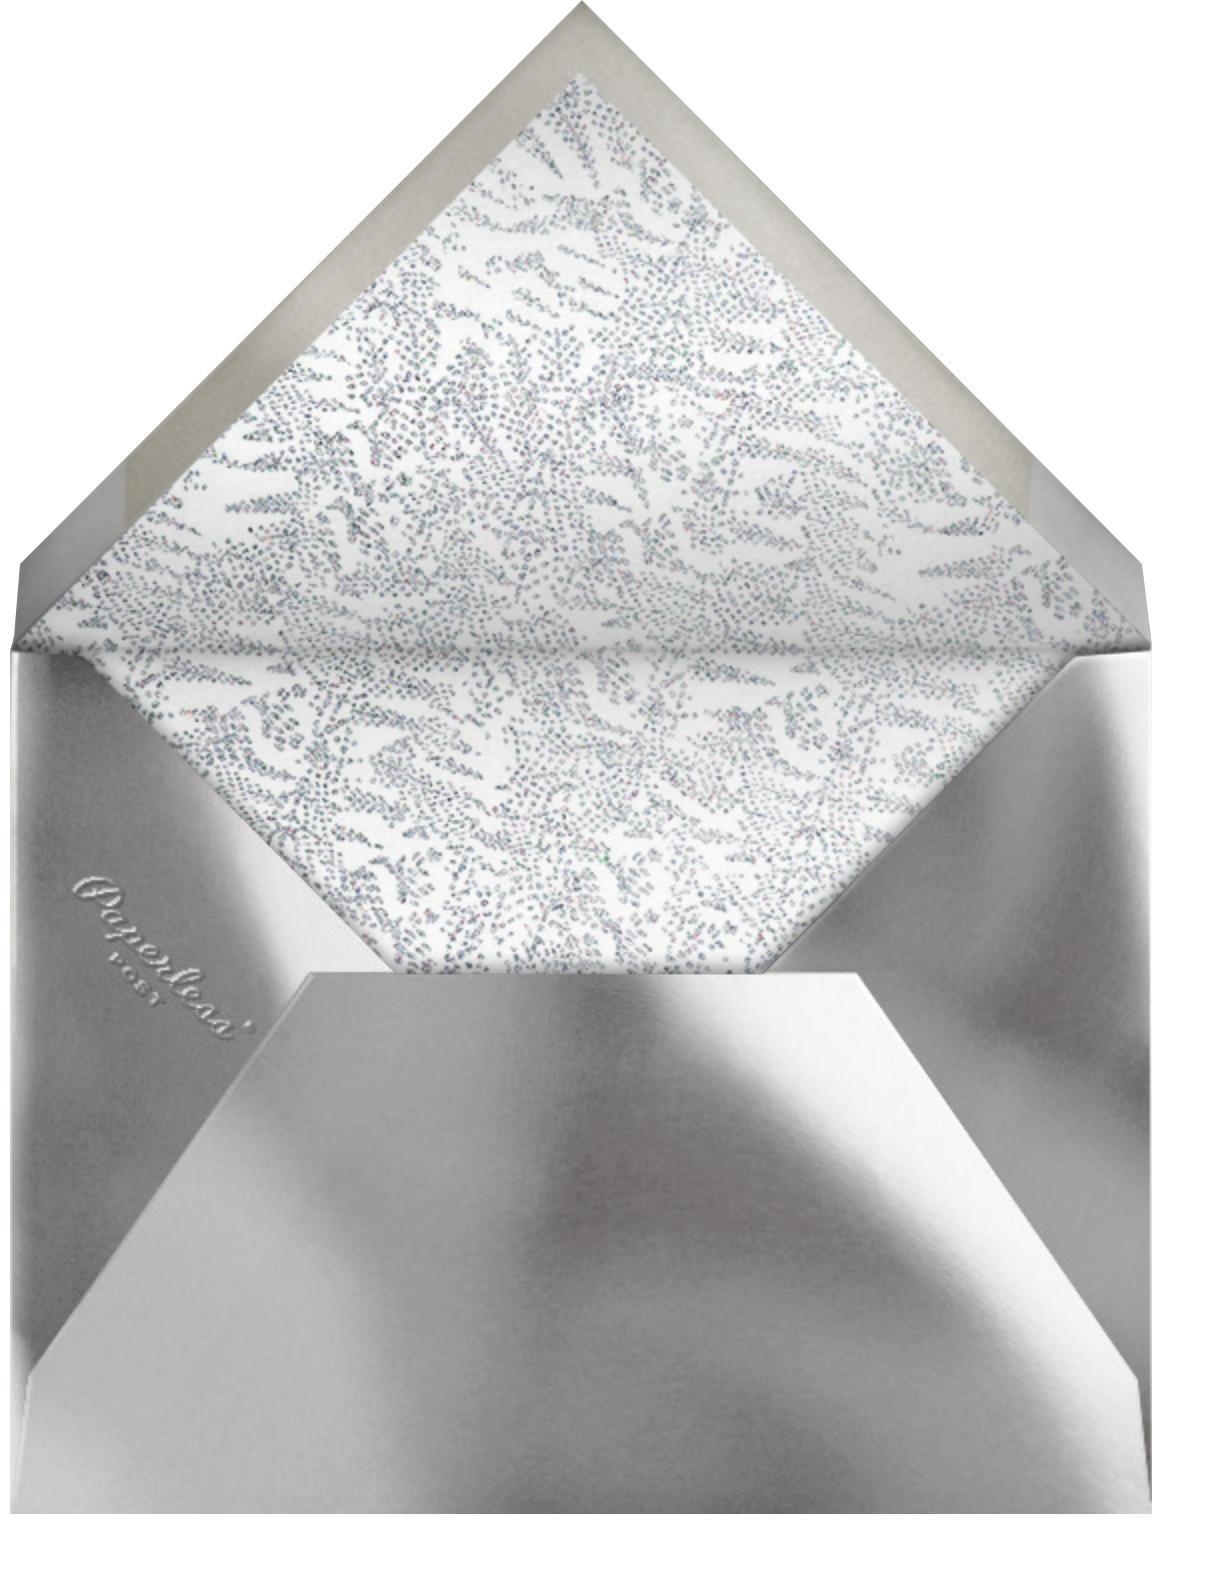 Crystal Pines Christmas (Greeting) - Dark Blue - Paperless Post - Christmas - envelope back